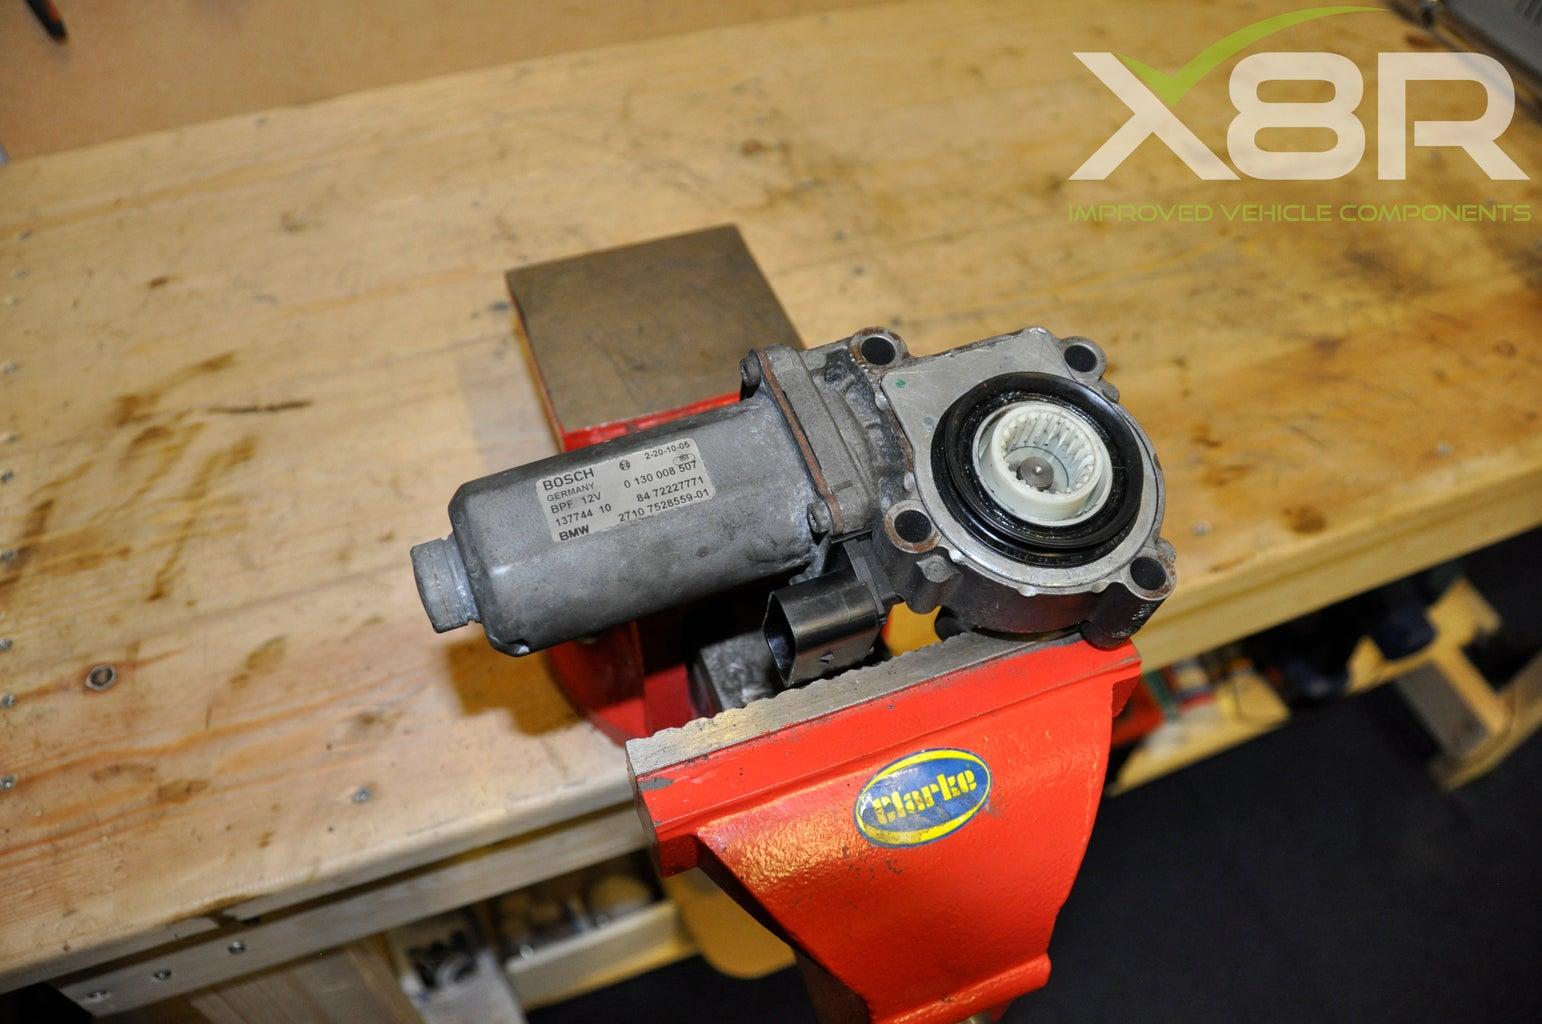 BMW X3 X5 X6 Gear Box Transfer Case Servo Actuator Motor Repair Gear Installation Instructions Guide.